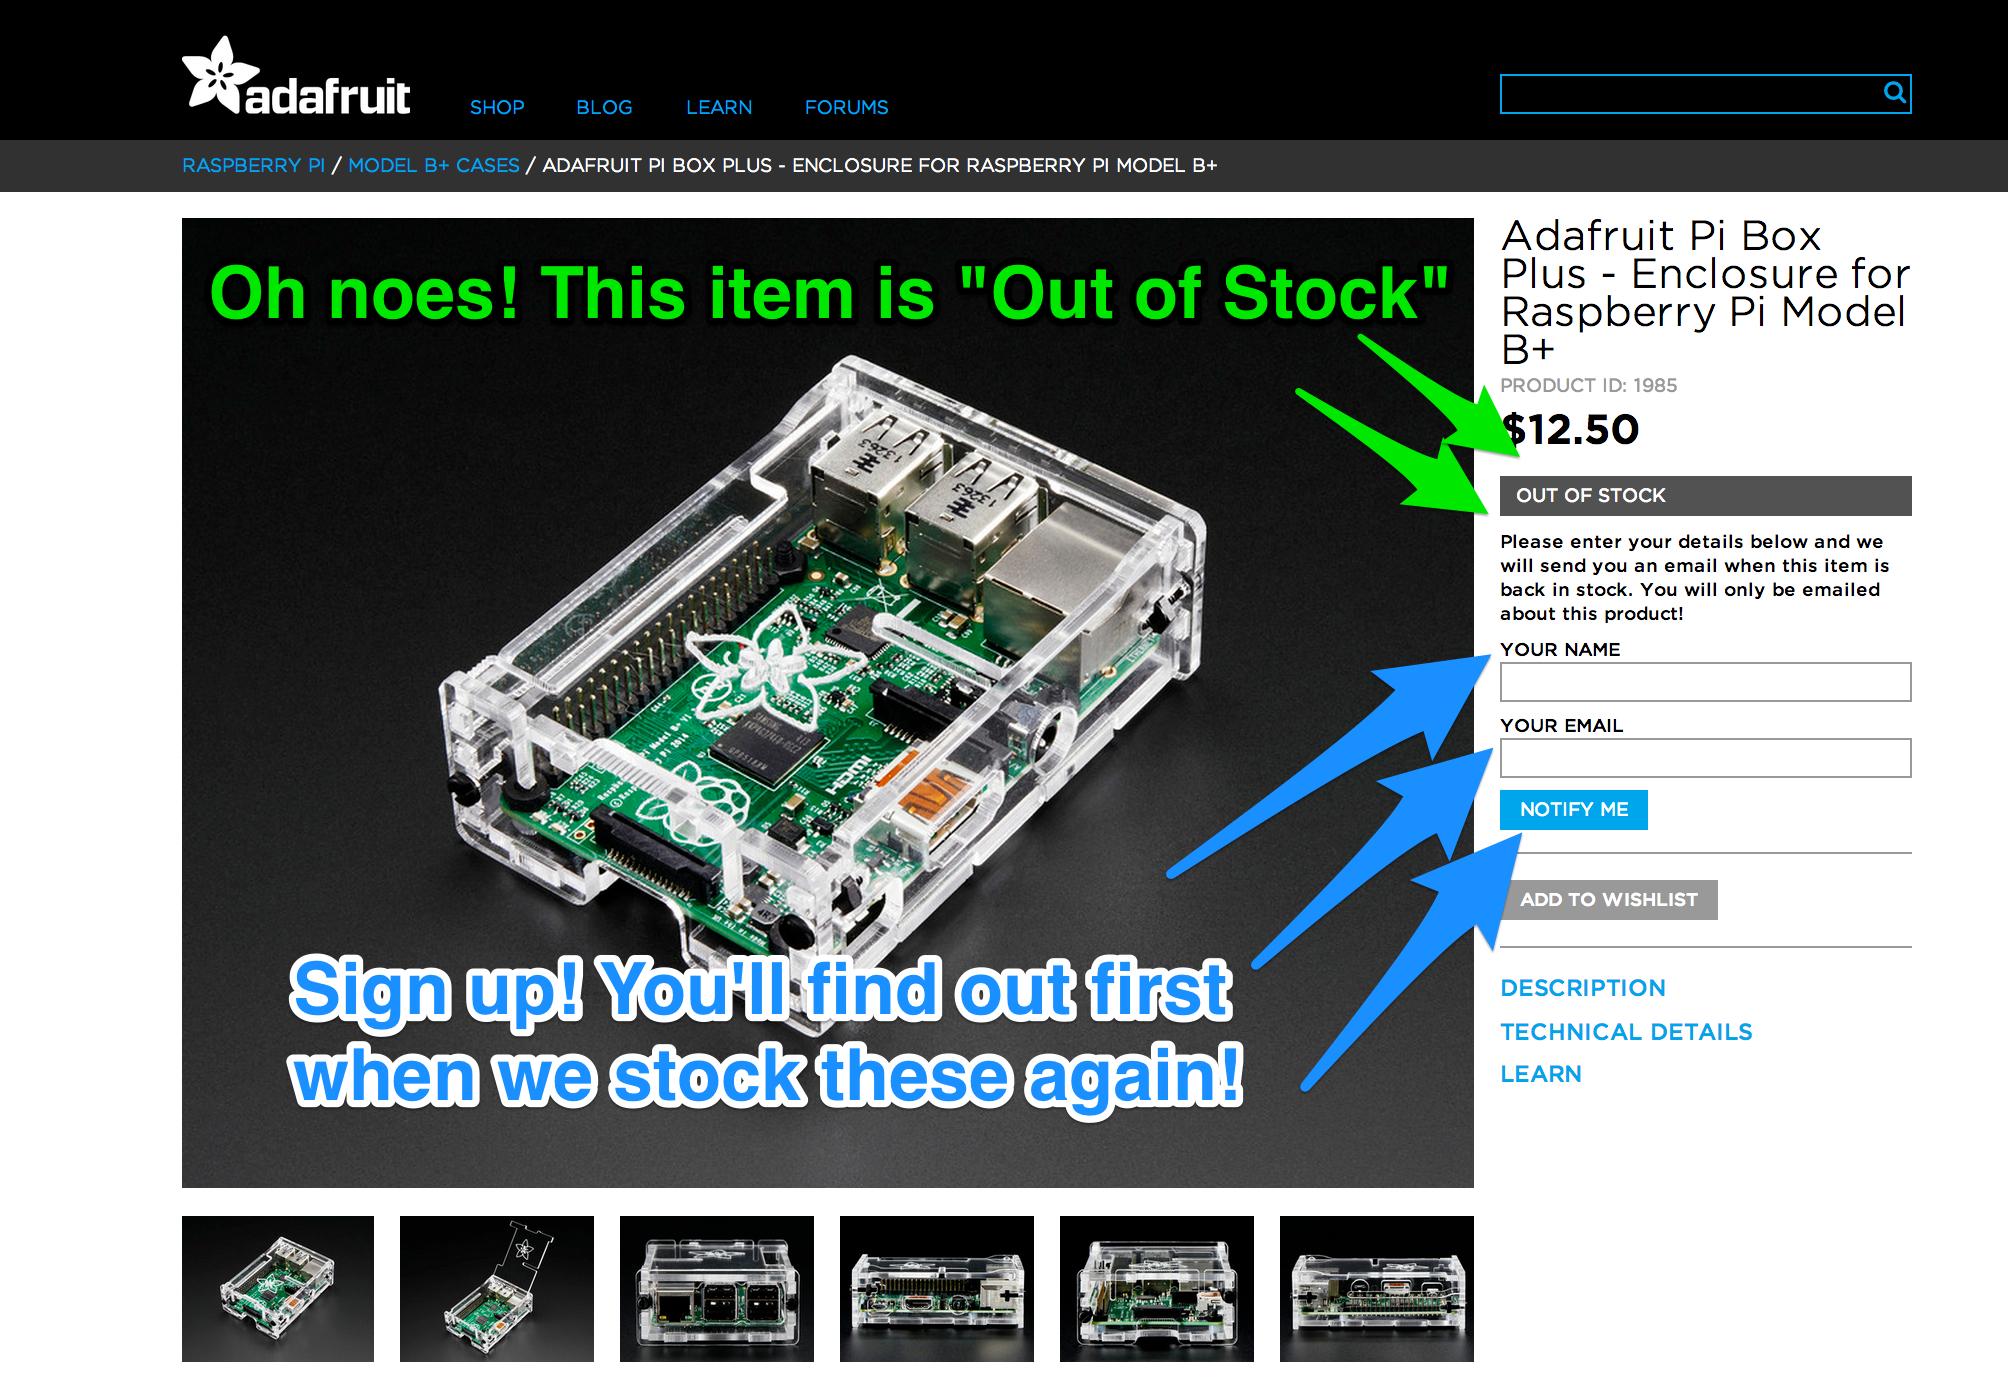 community_support_Adafruit_Pi_Box_Plus_-_Enclosure_for_Raspberry_Pi_Model_B__ID__1985_-__12_50___Adafruit_Industries__Unique___fun_DIY_electronics_and_kits.jpg